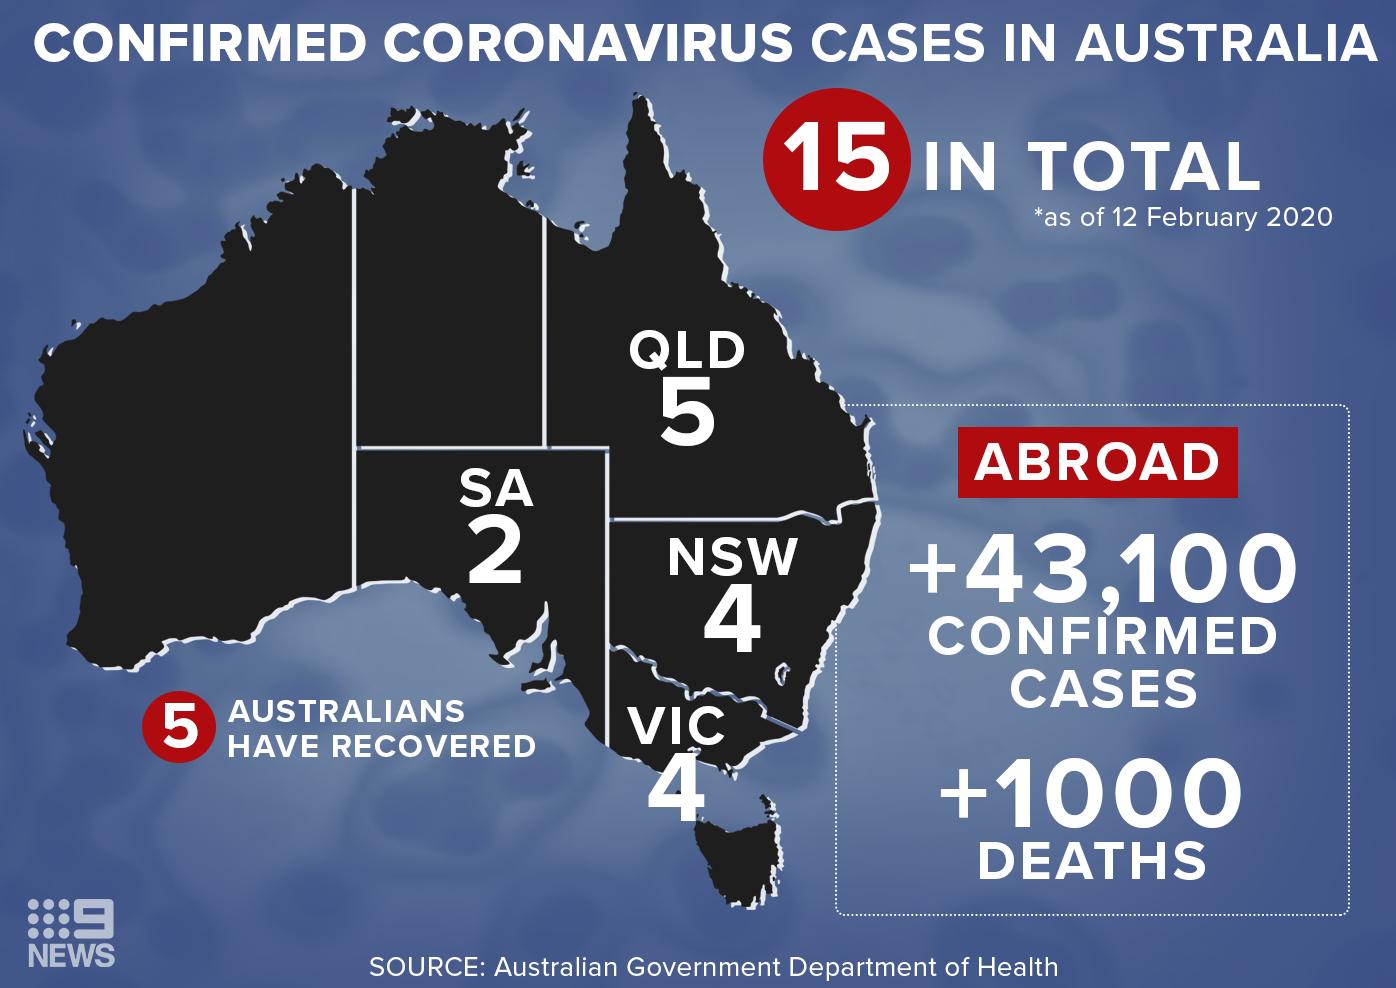 Confirmed coronavirus cases in Australia according to the Department of Health.